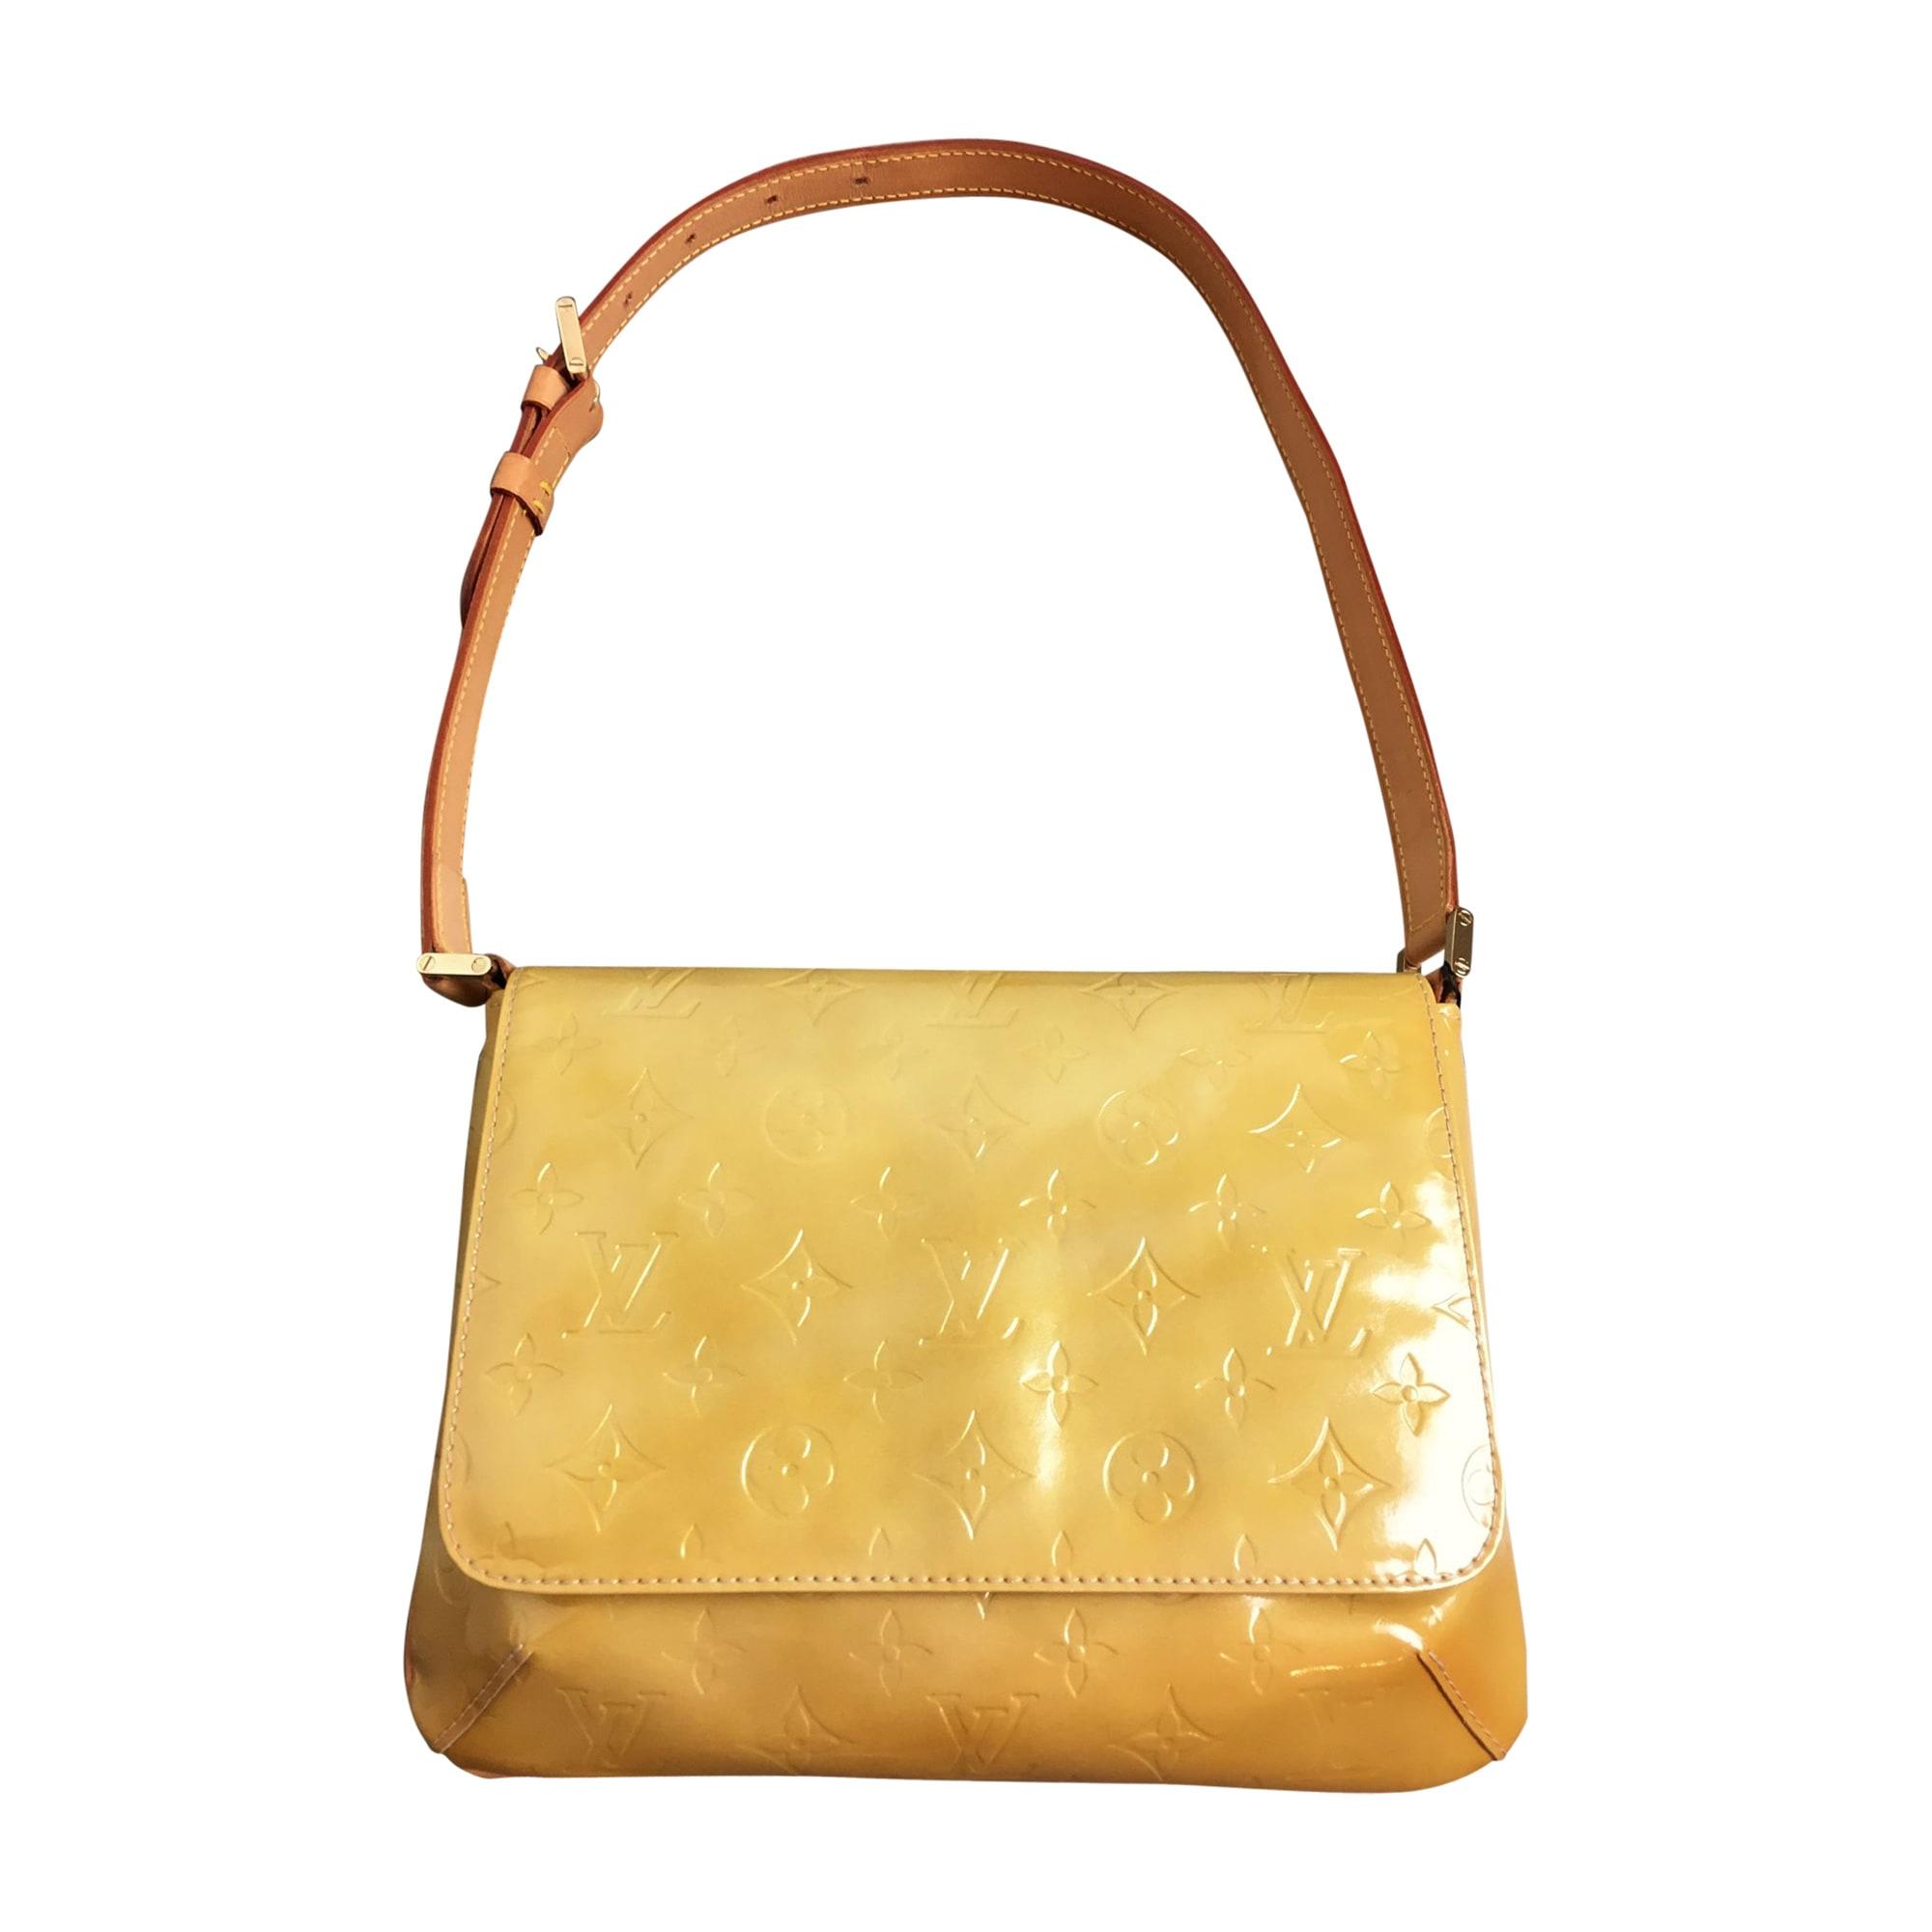 Sac en bandoulière en cuir LOUIS VUITTON jaune - 7736903 9171e5a02da